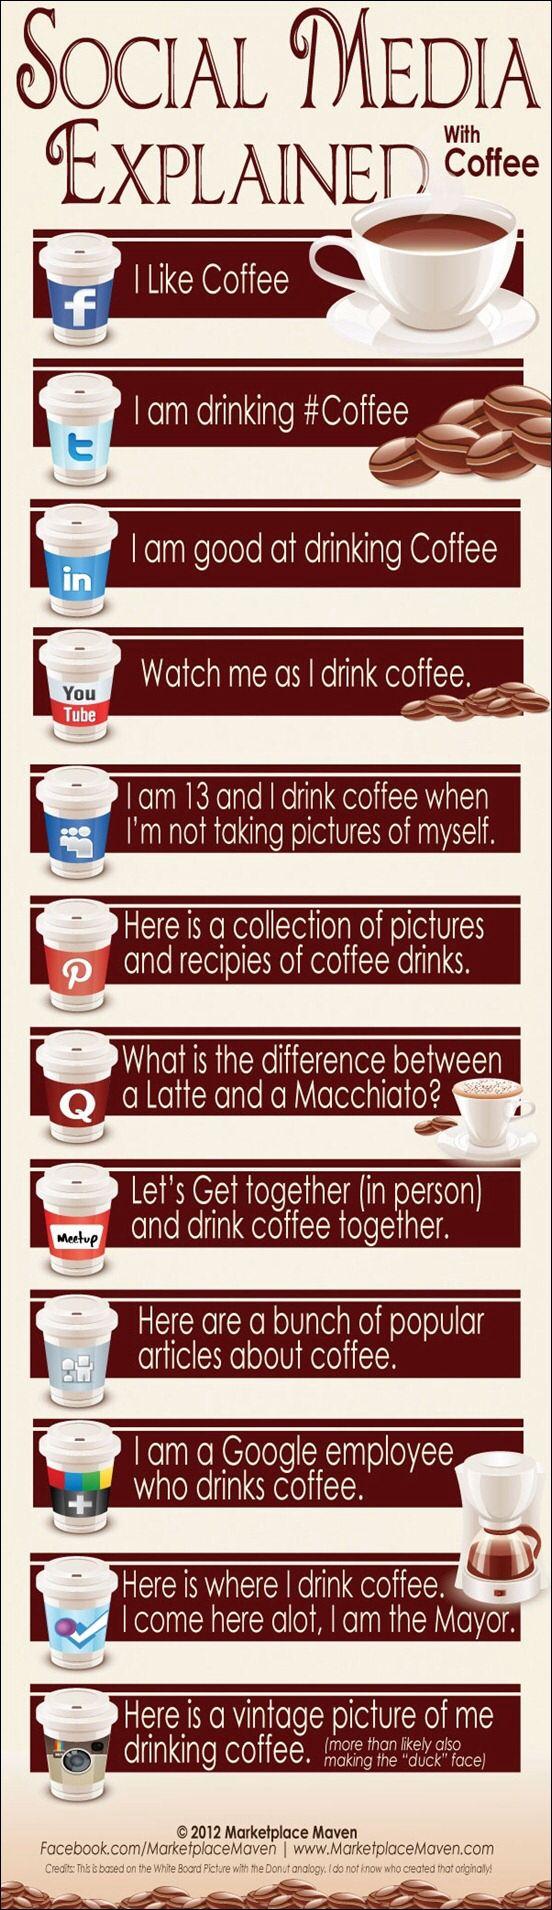 Social networks like Coffee